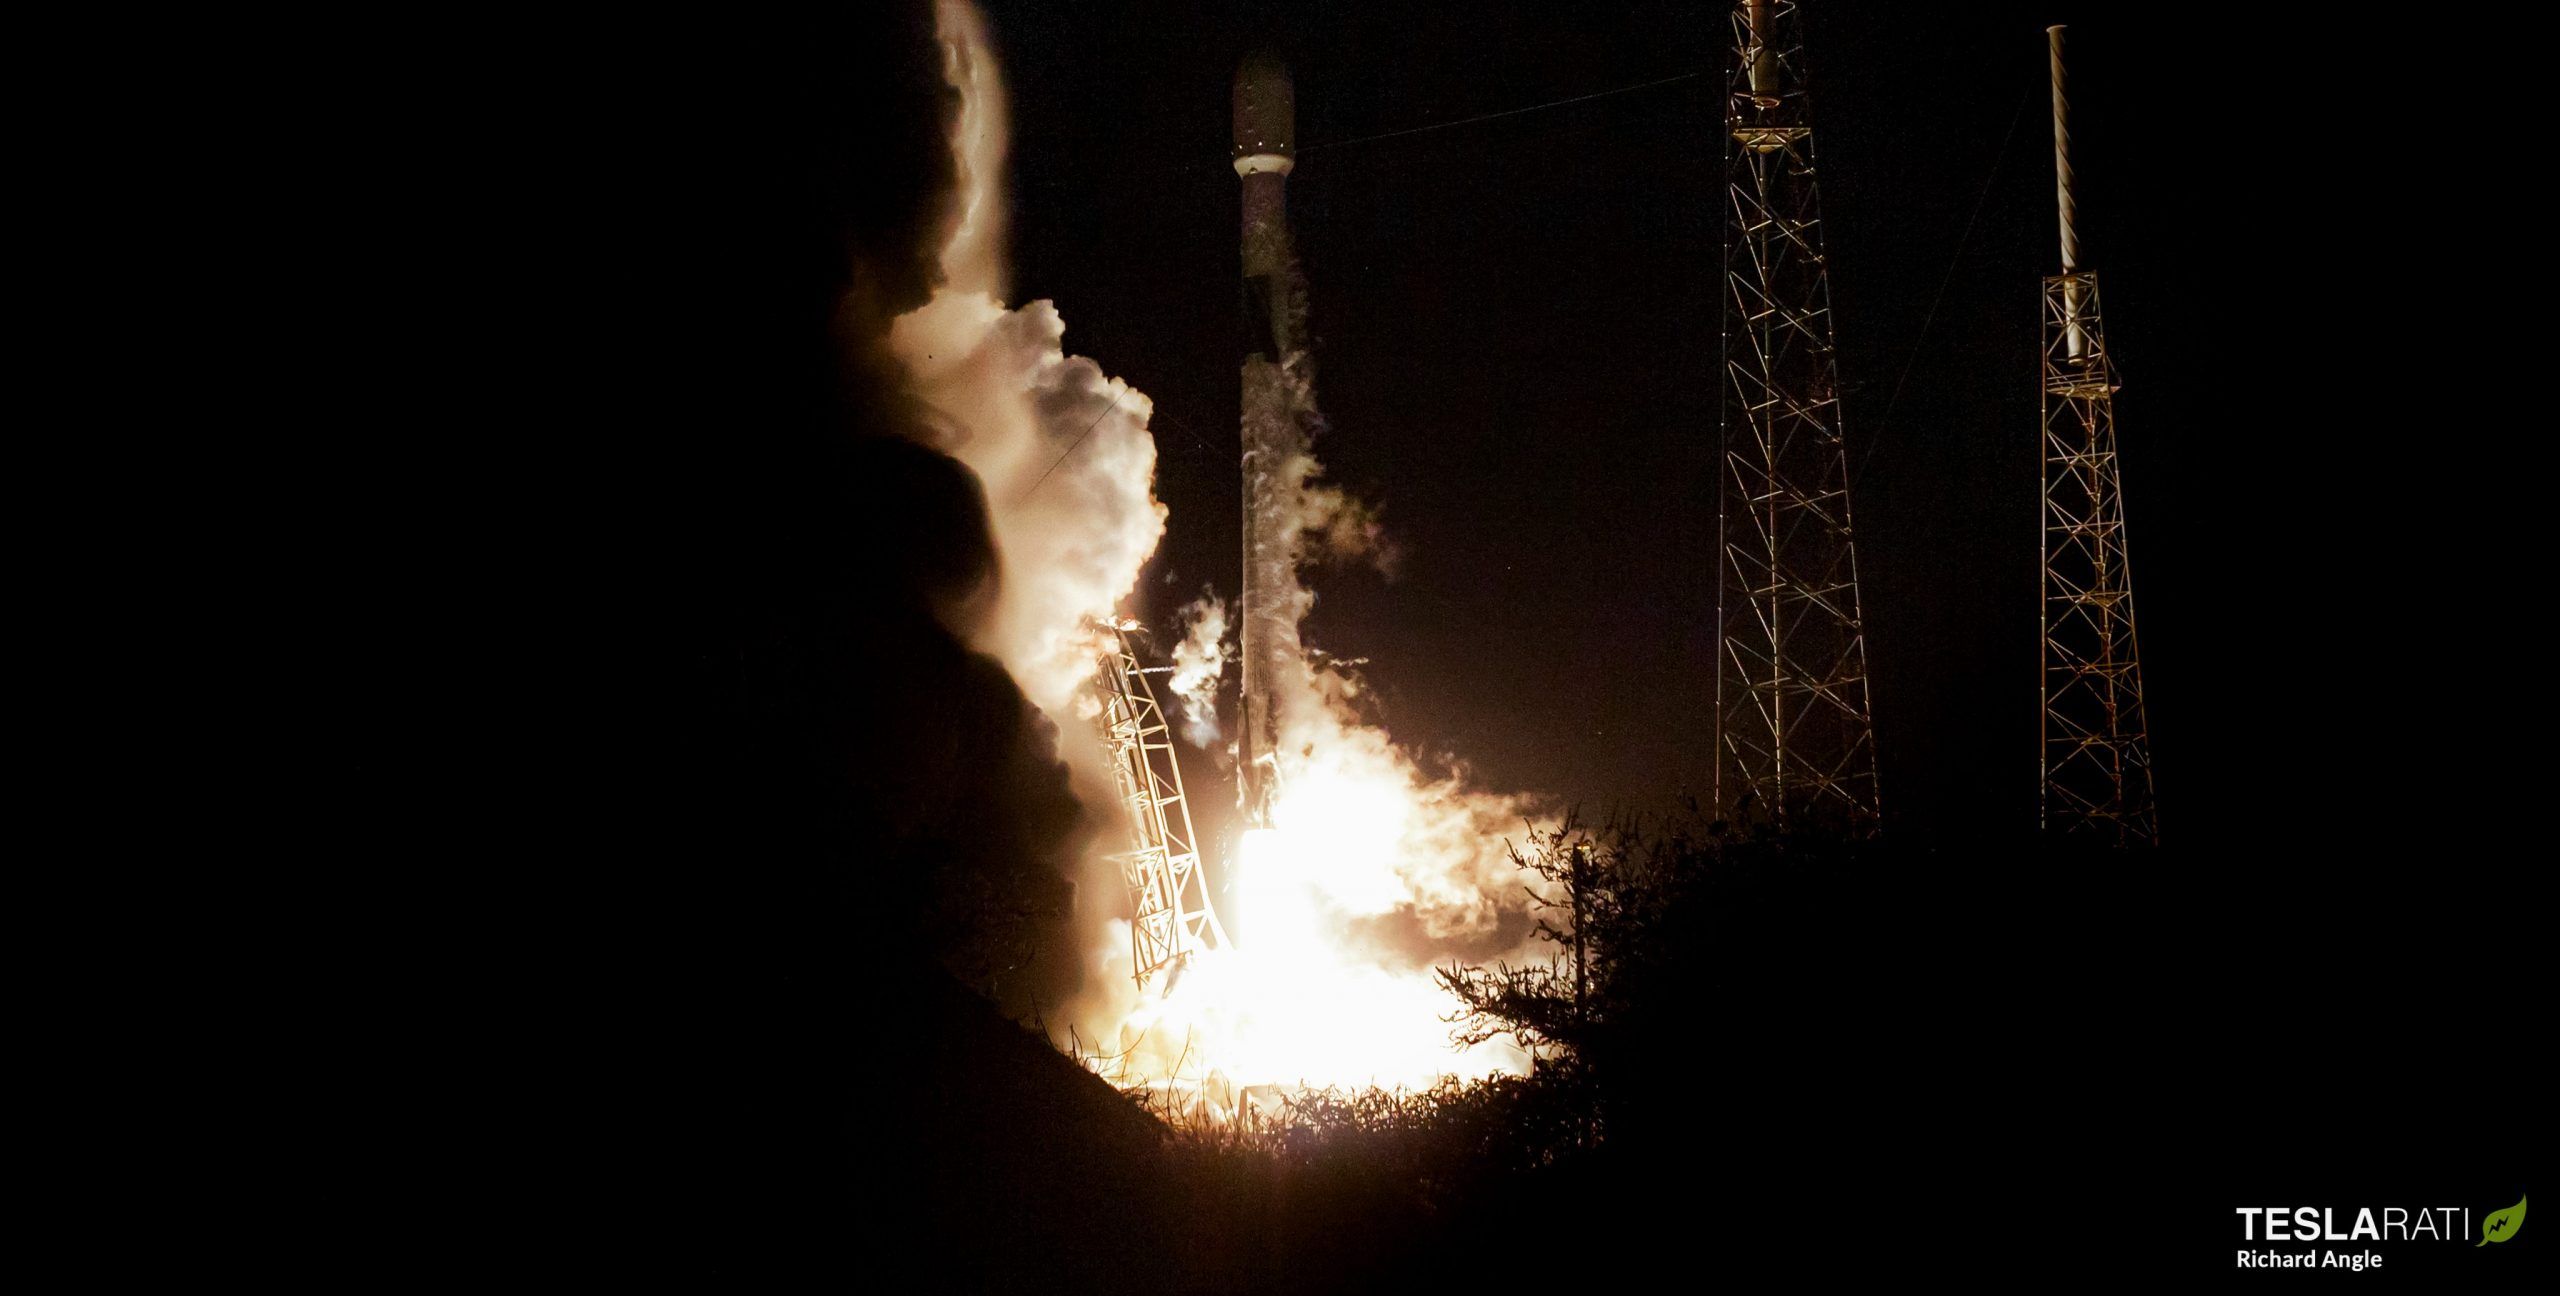 Starlink-8 Falcon 9 B1049 LC-40 060320 (Richard Angle) launch 2 crop